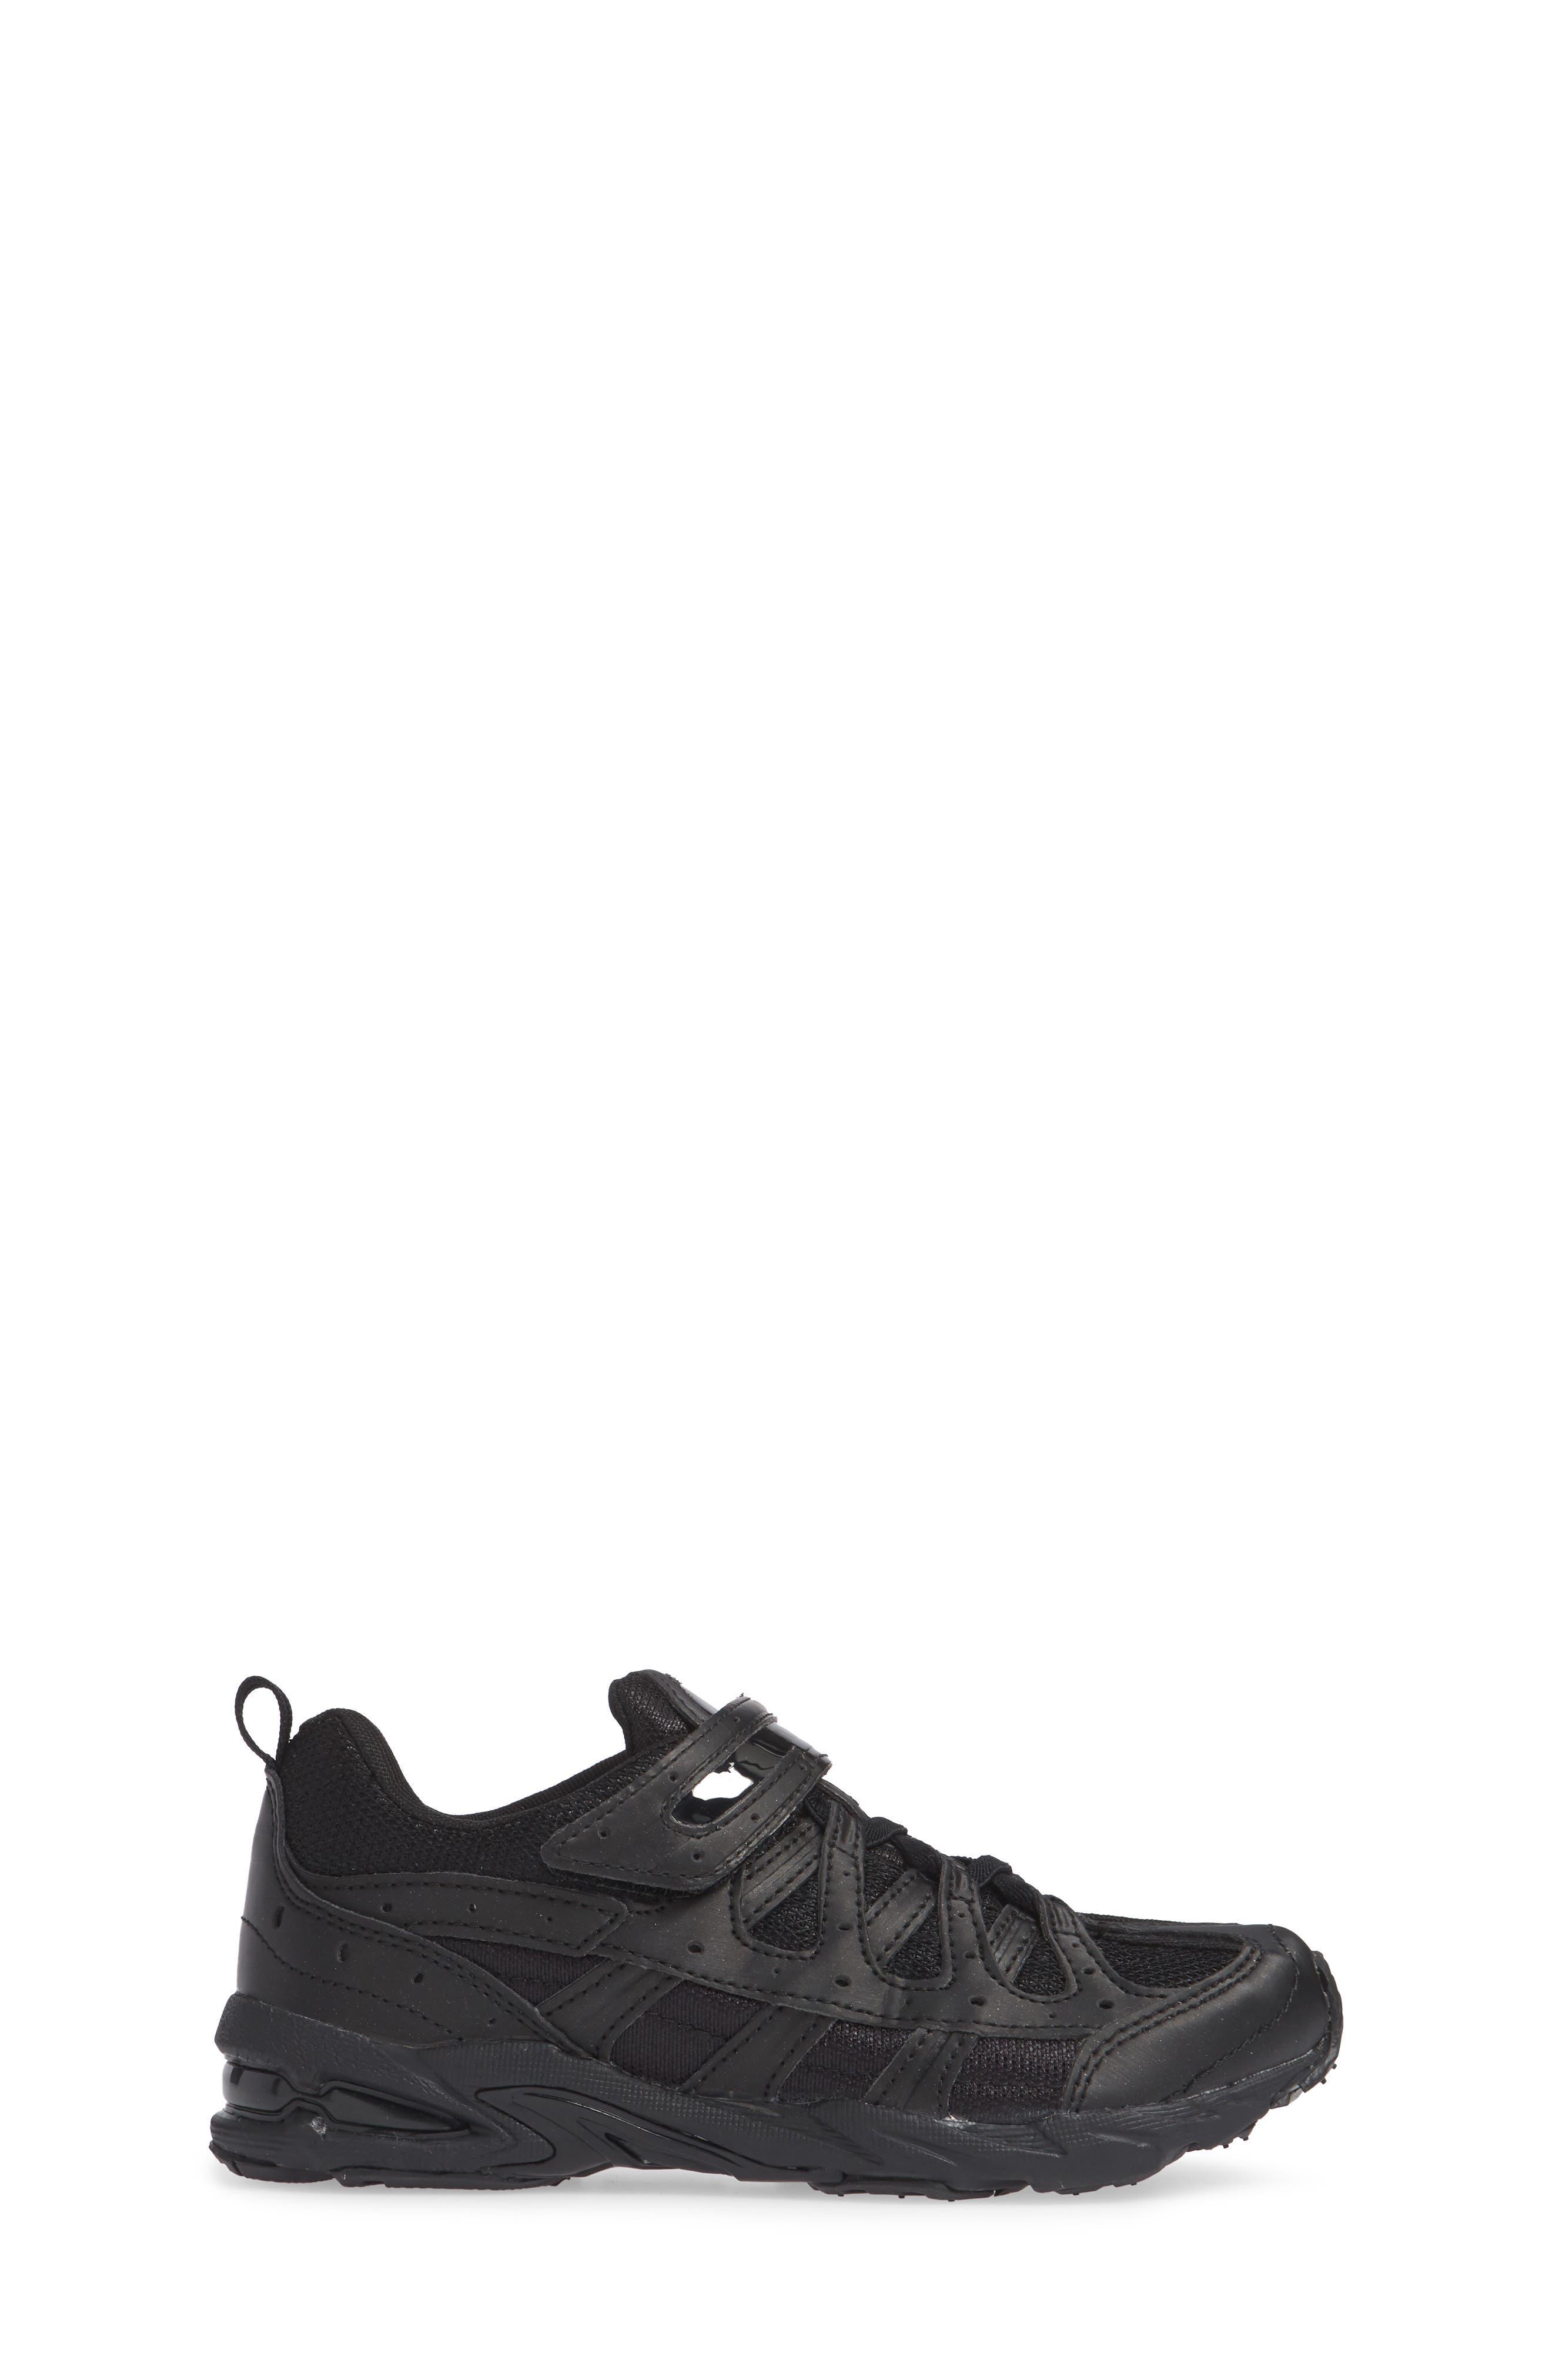 TSUKIHOSHI, Speed Washable Sneaker, Alternate thumbnail 3, color, BLACK/ NOIR